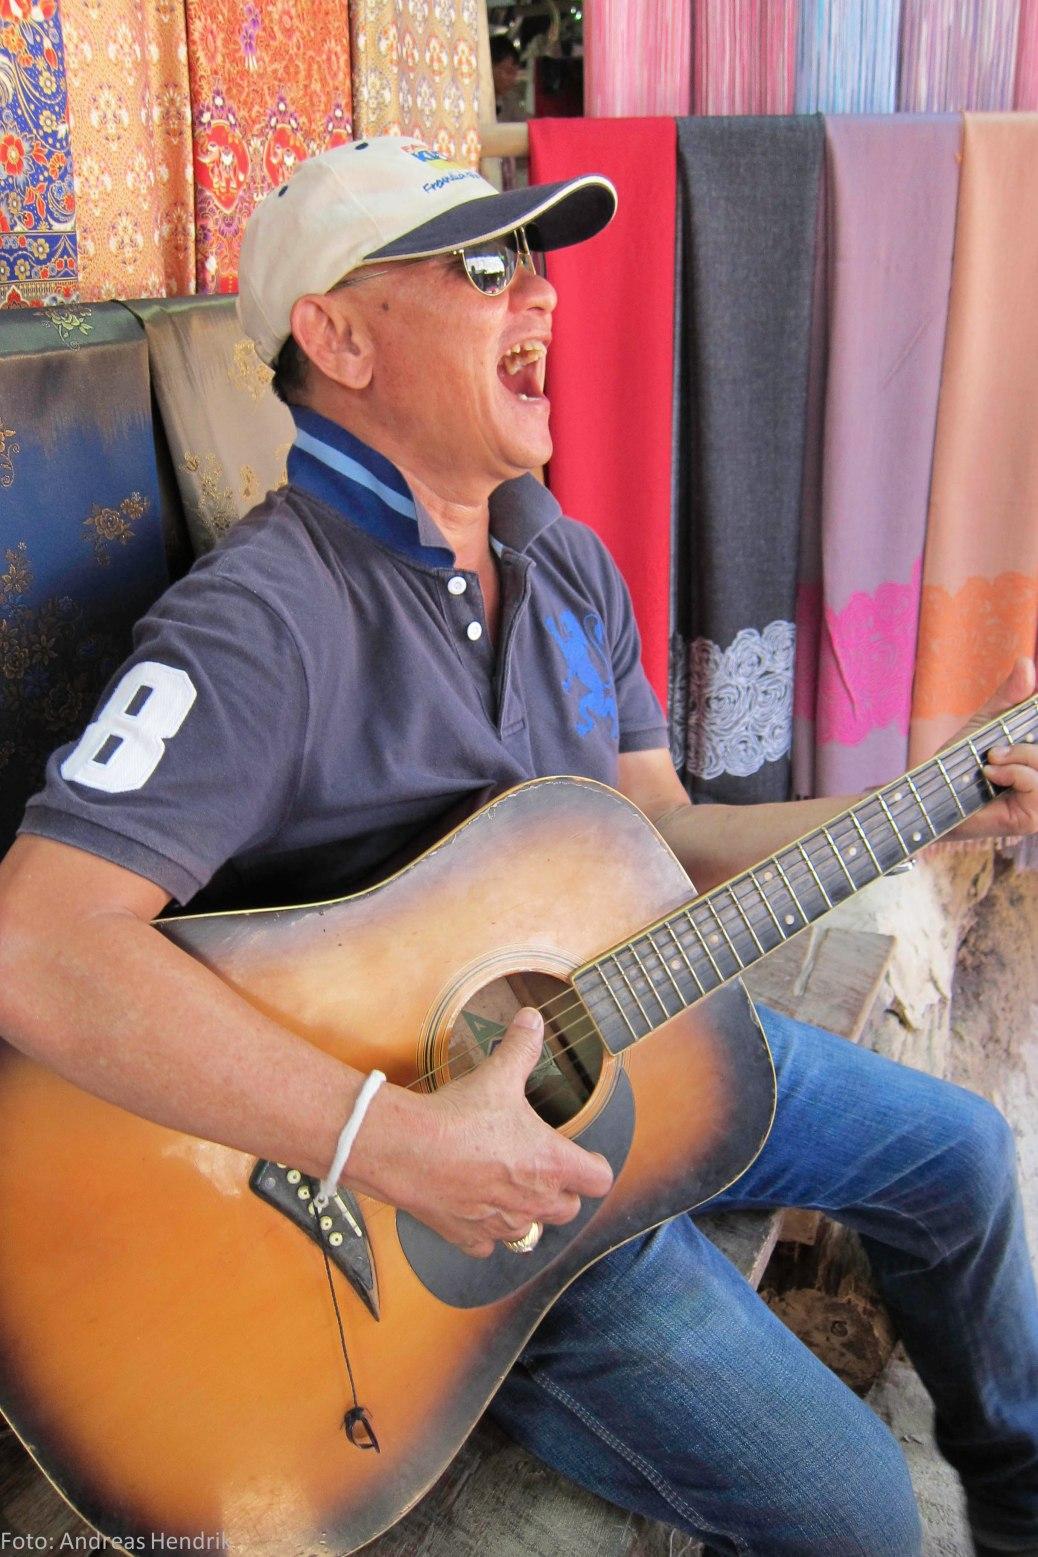 Jimmy Thailand singing